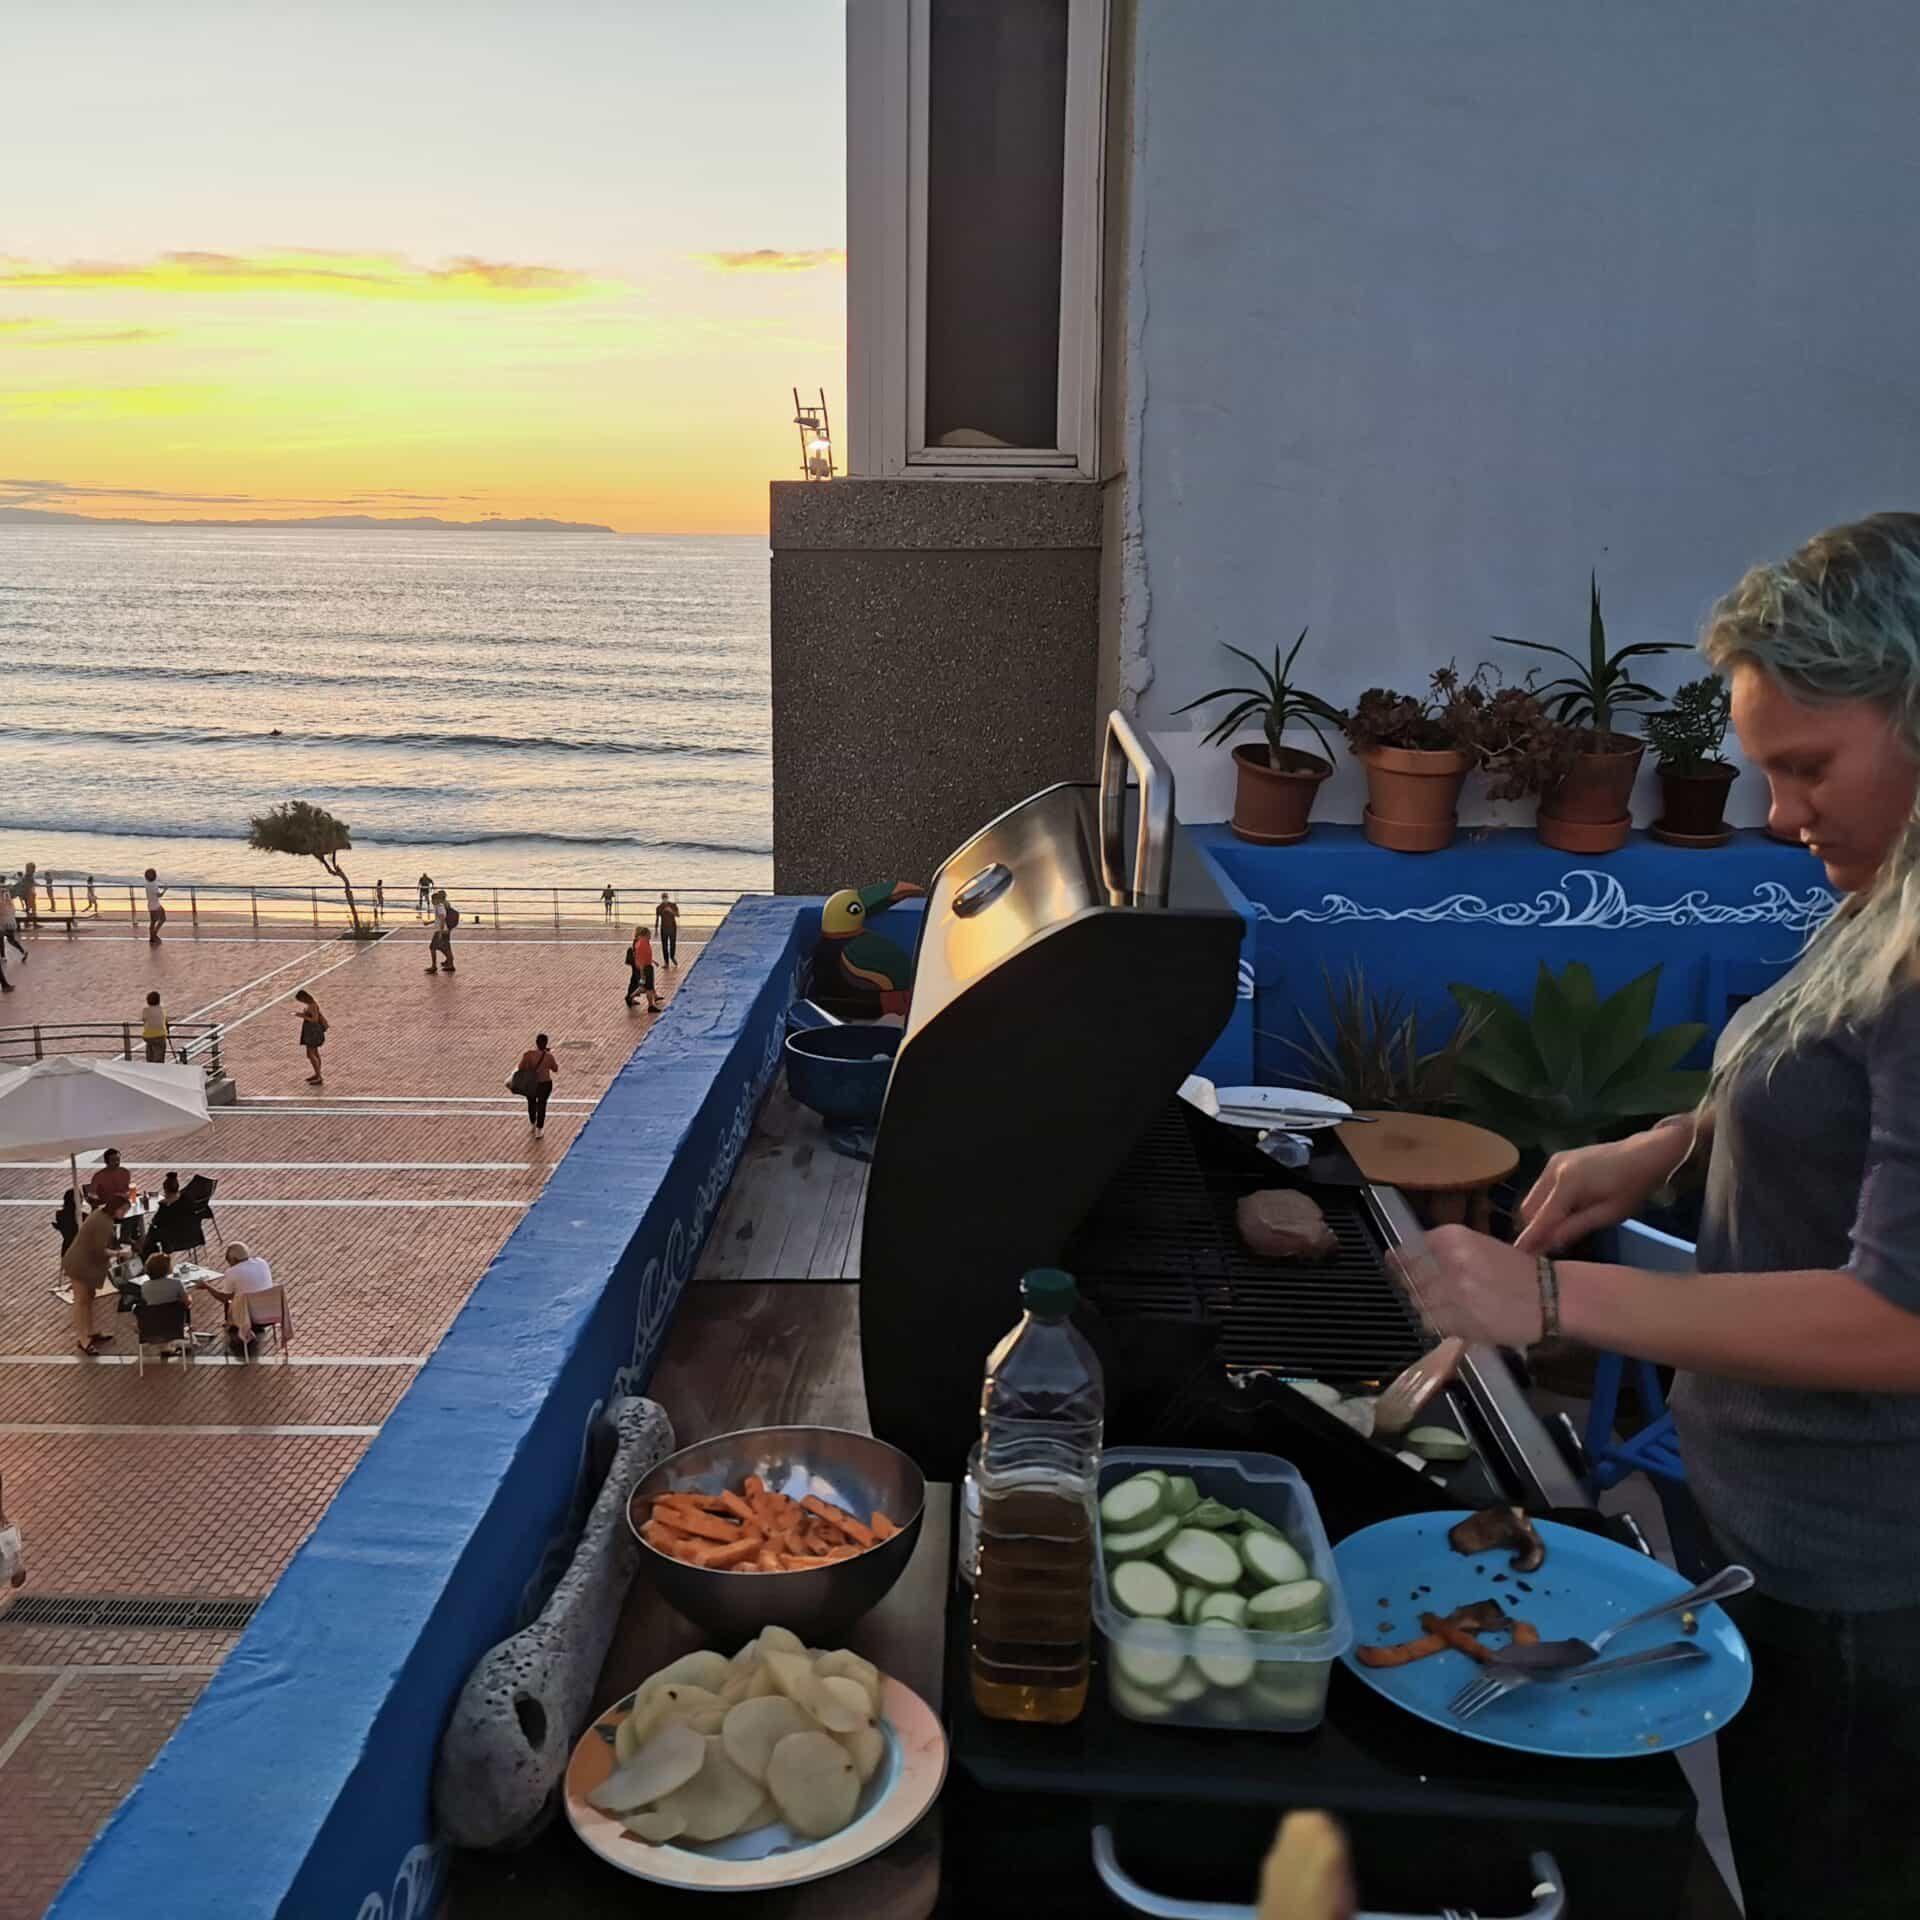 Barbecue-Bianca-Ventana-Azul-scaled-min